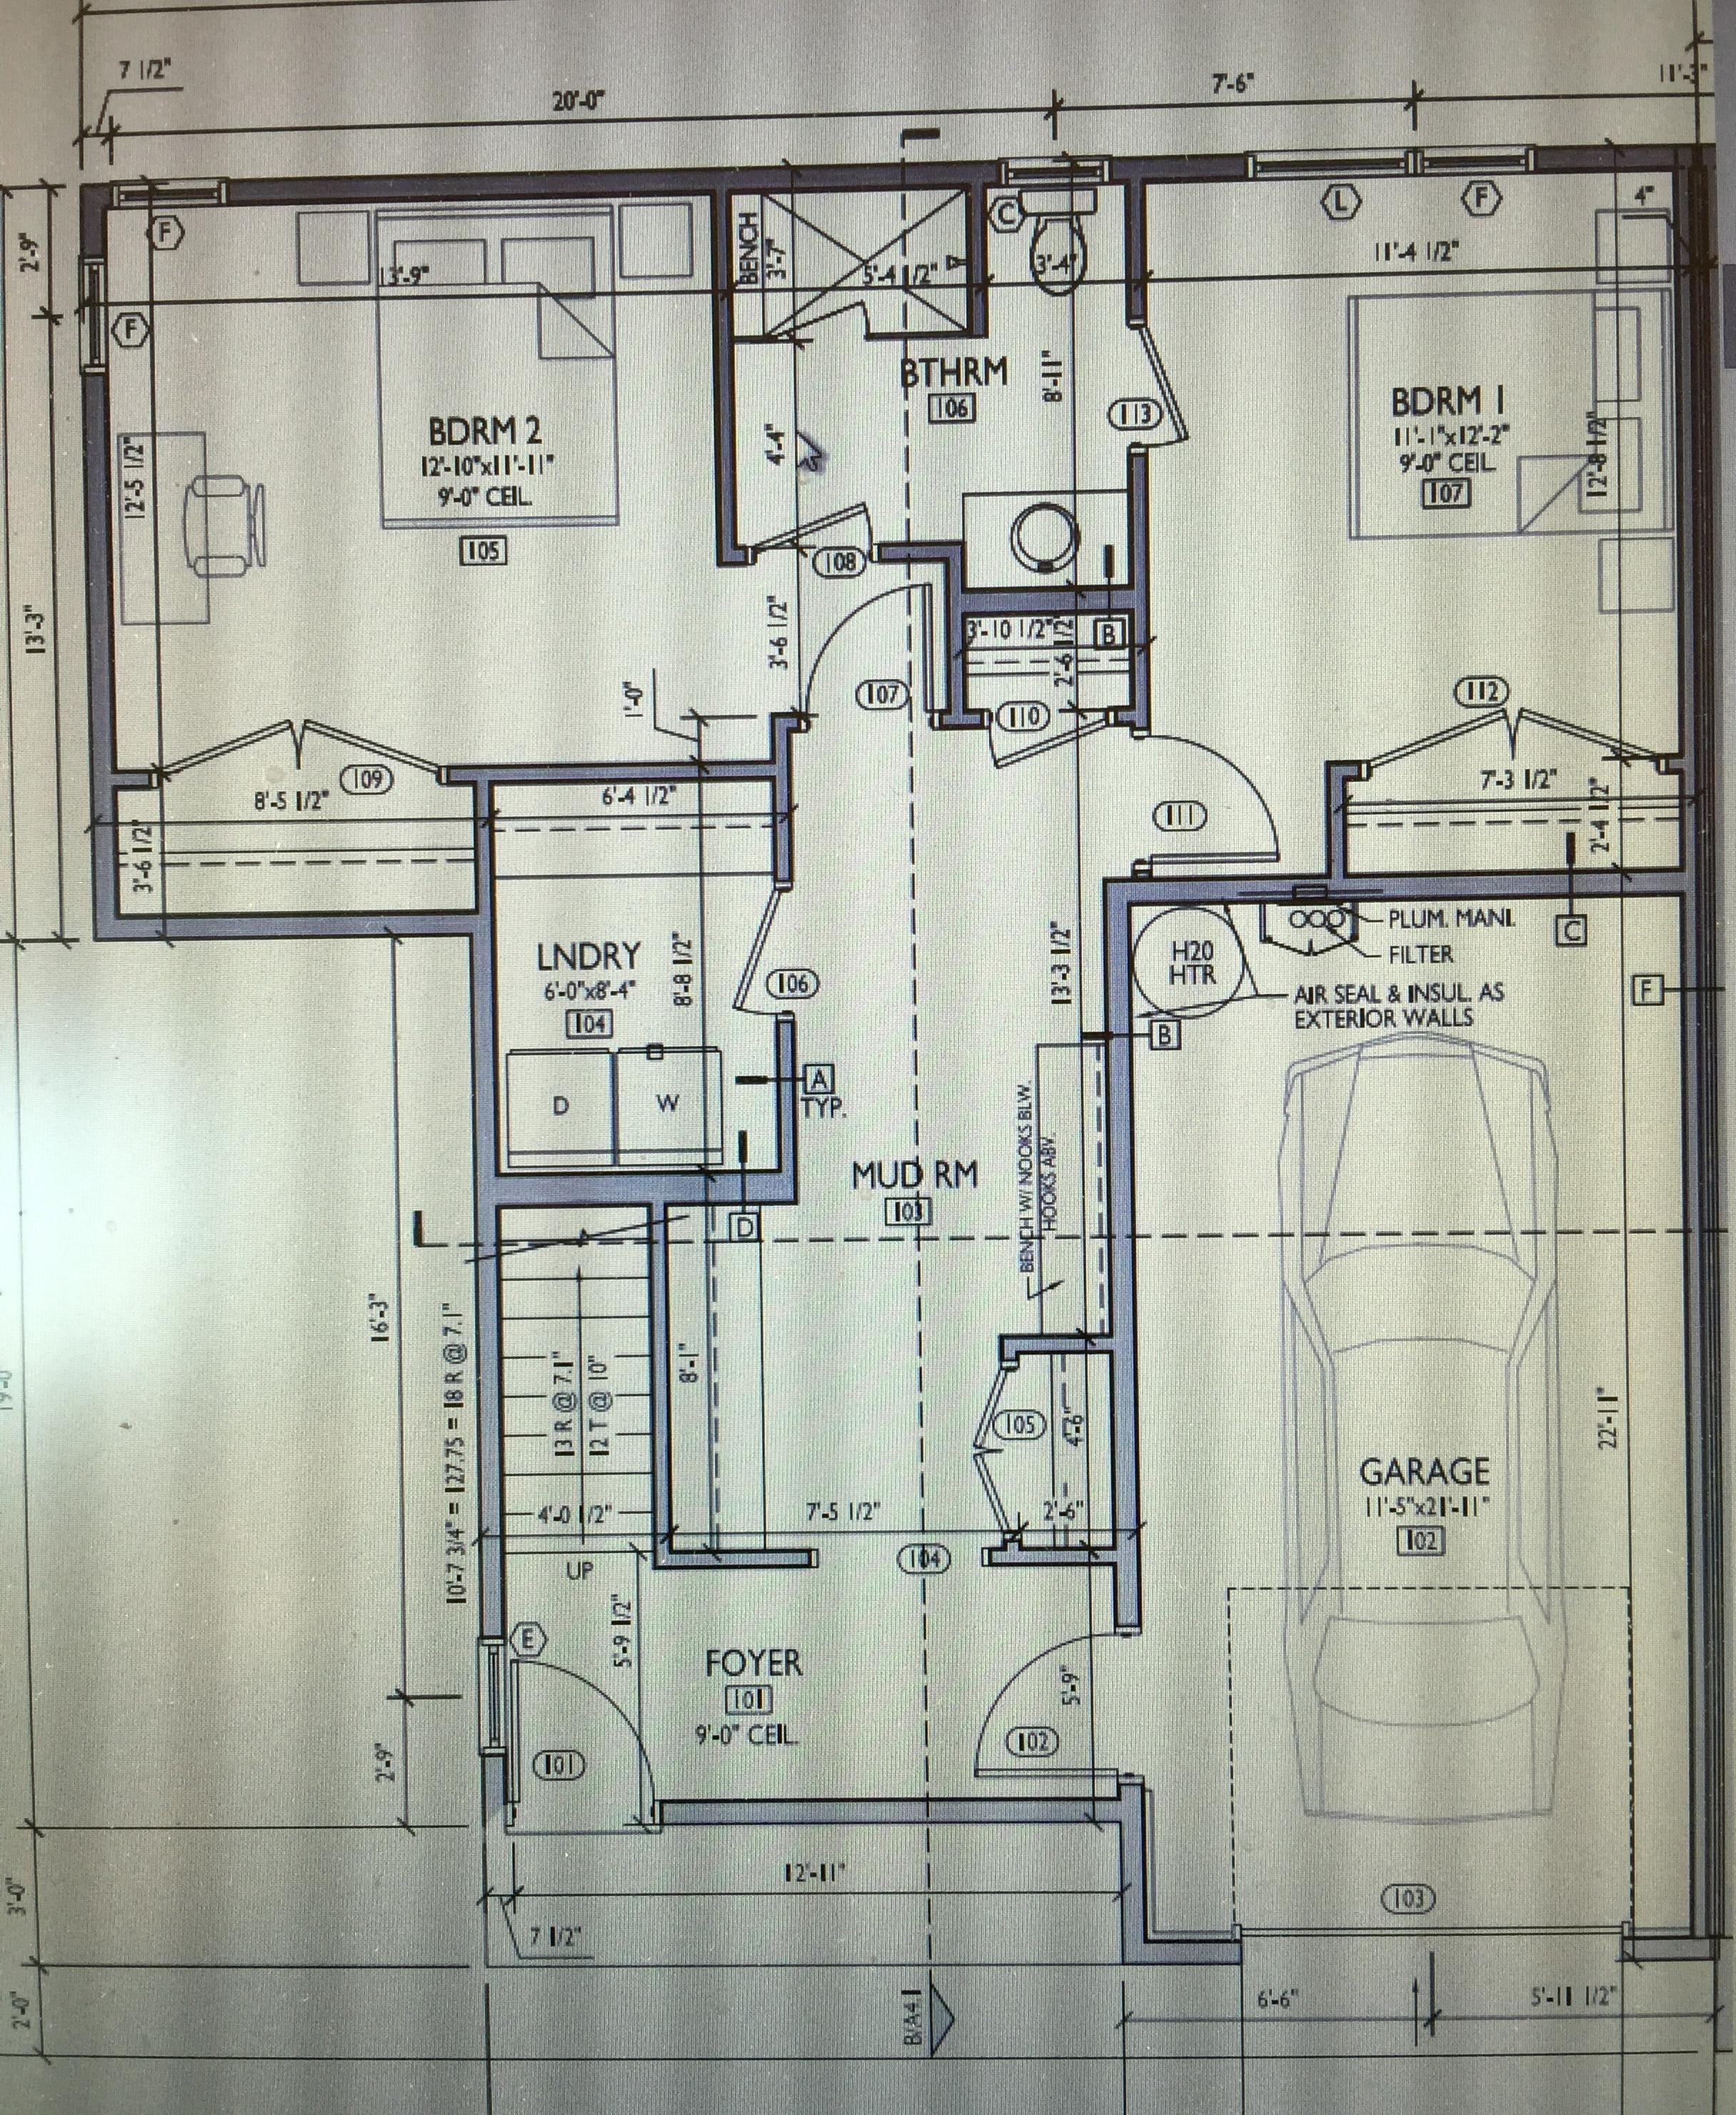 Tonbo Meadow layout